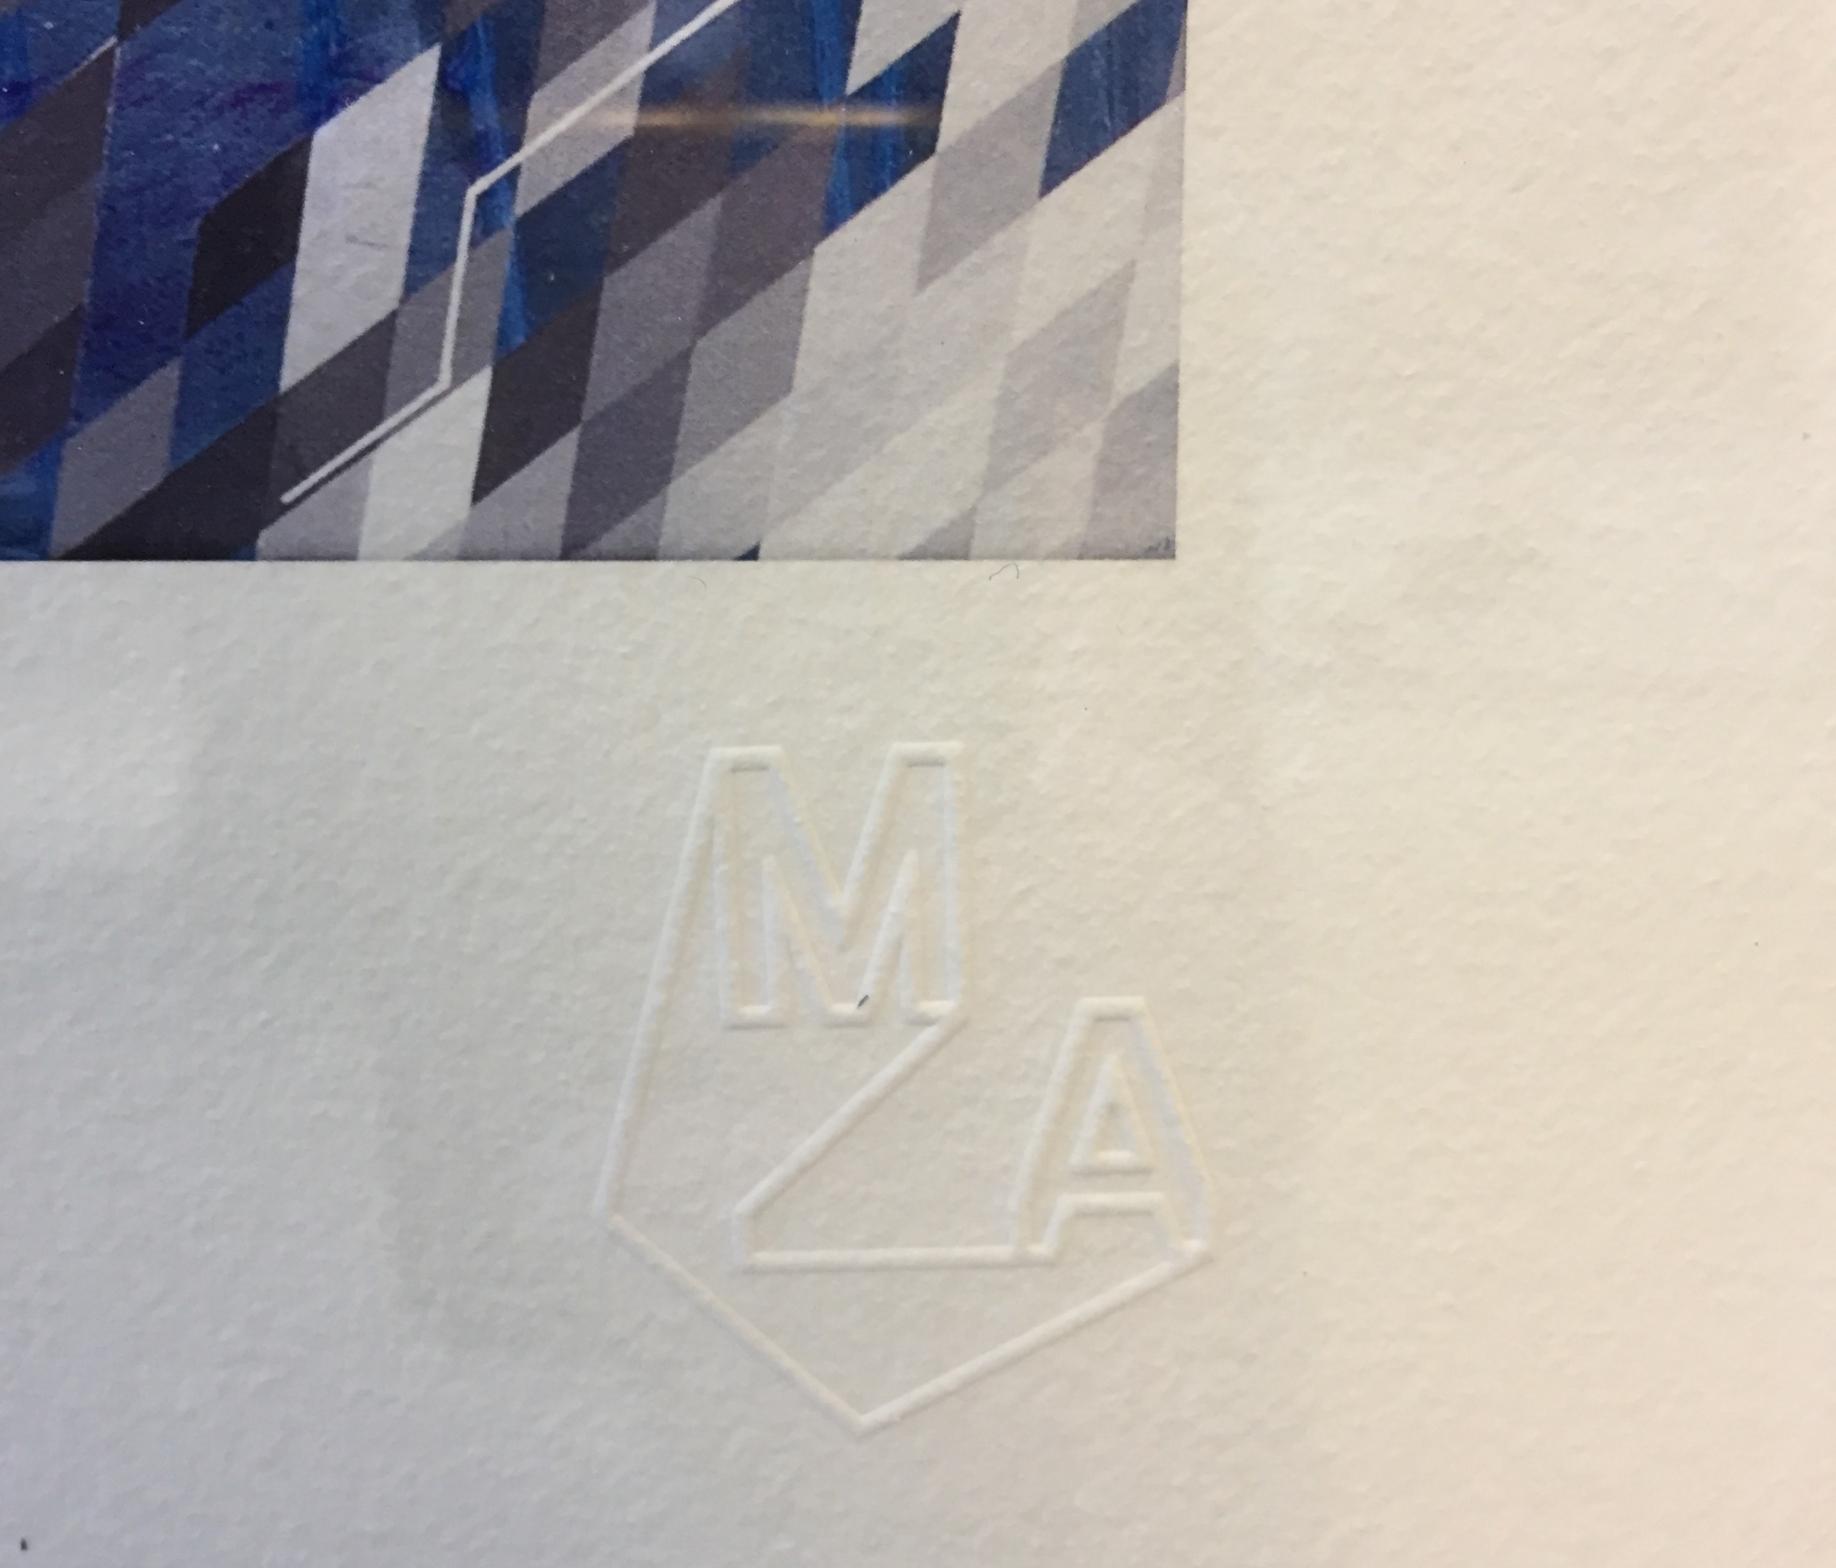 MA watermark.